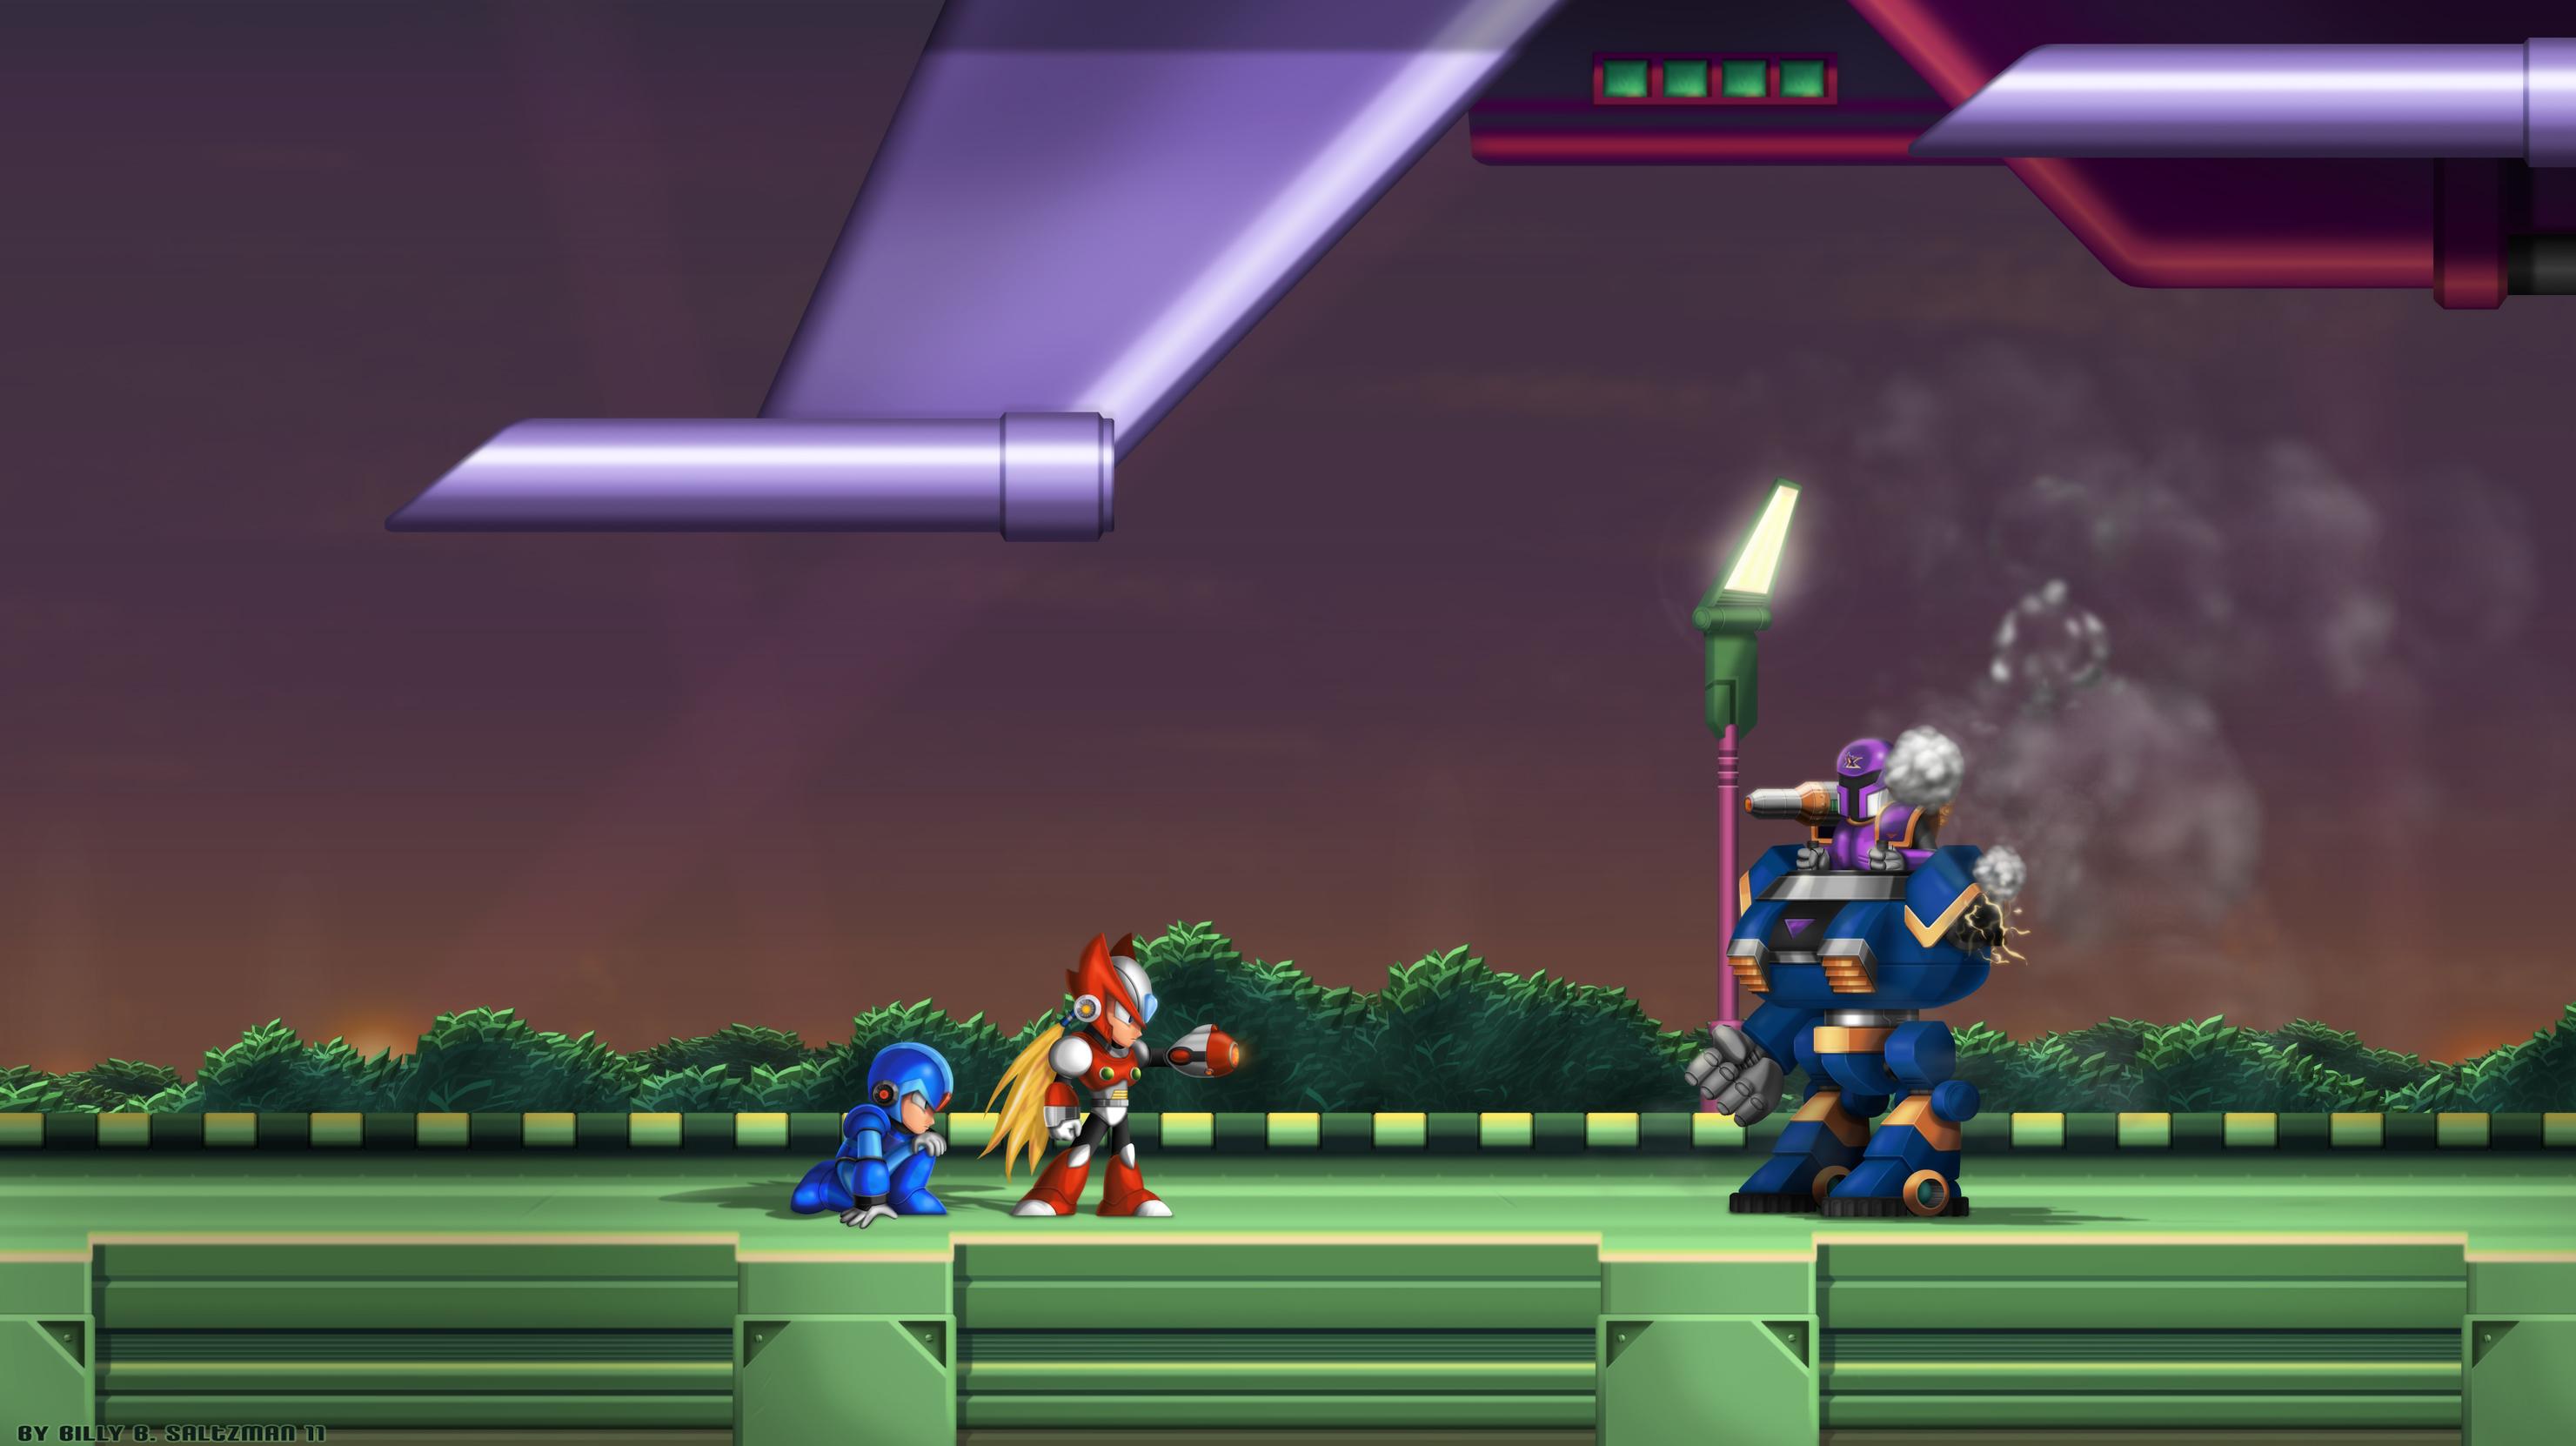 Mega Man X1 Zero Defense WIDE by Billysan291 on DeviantArt